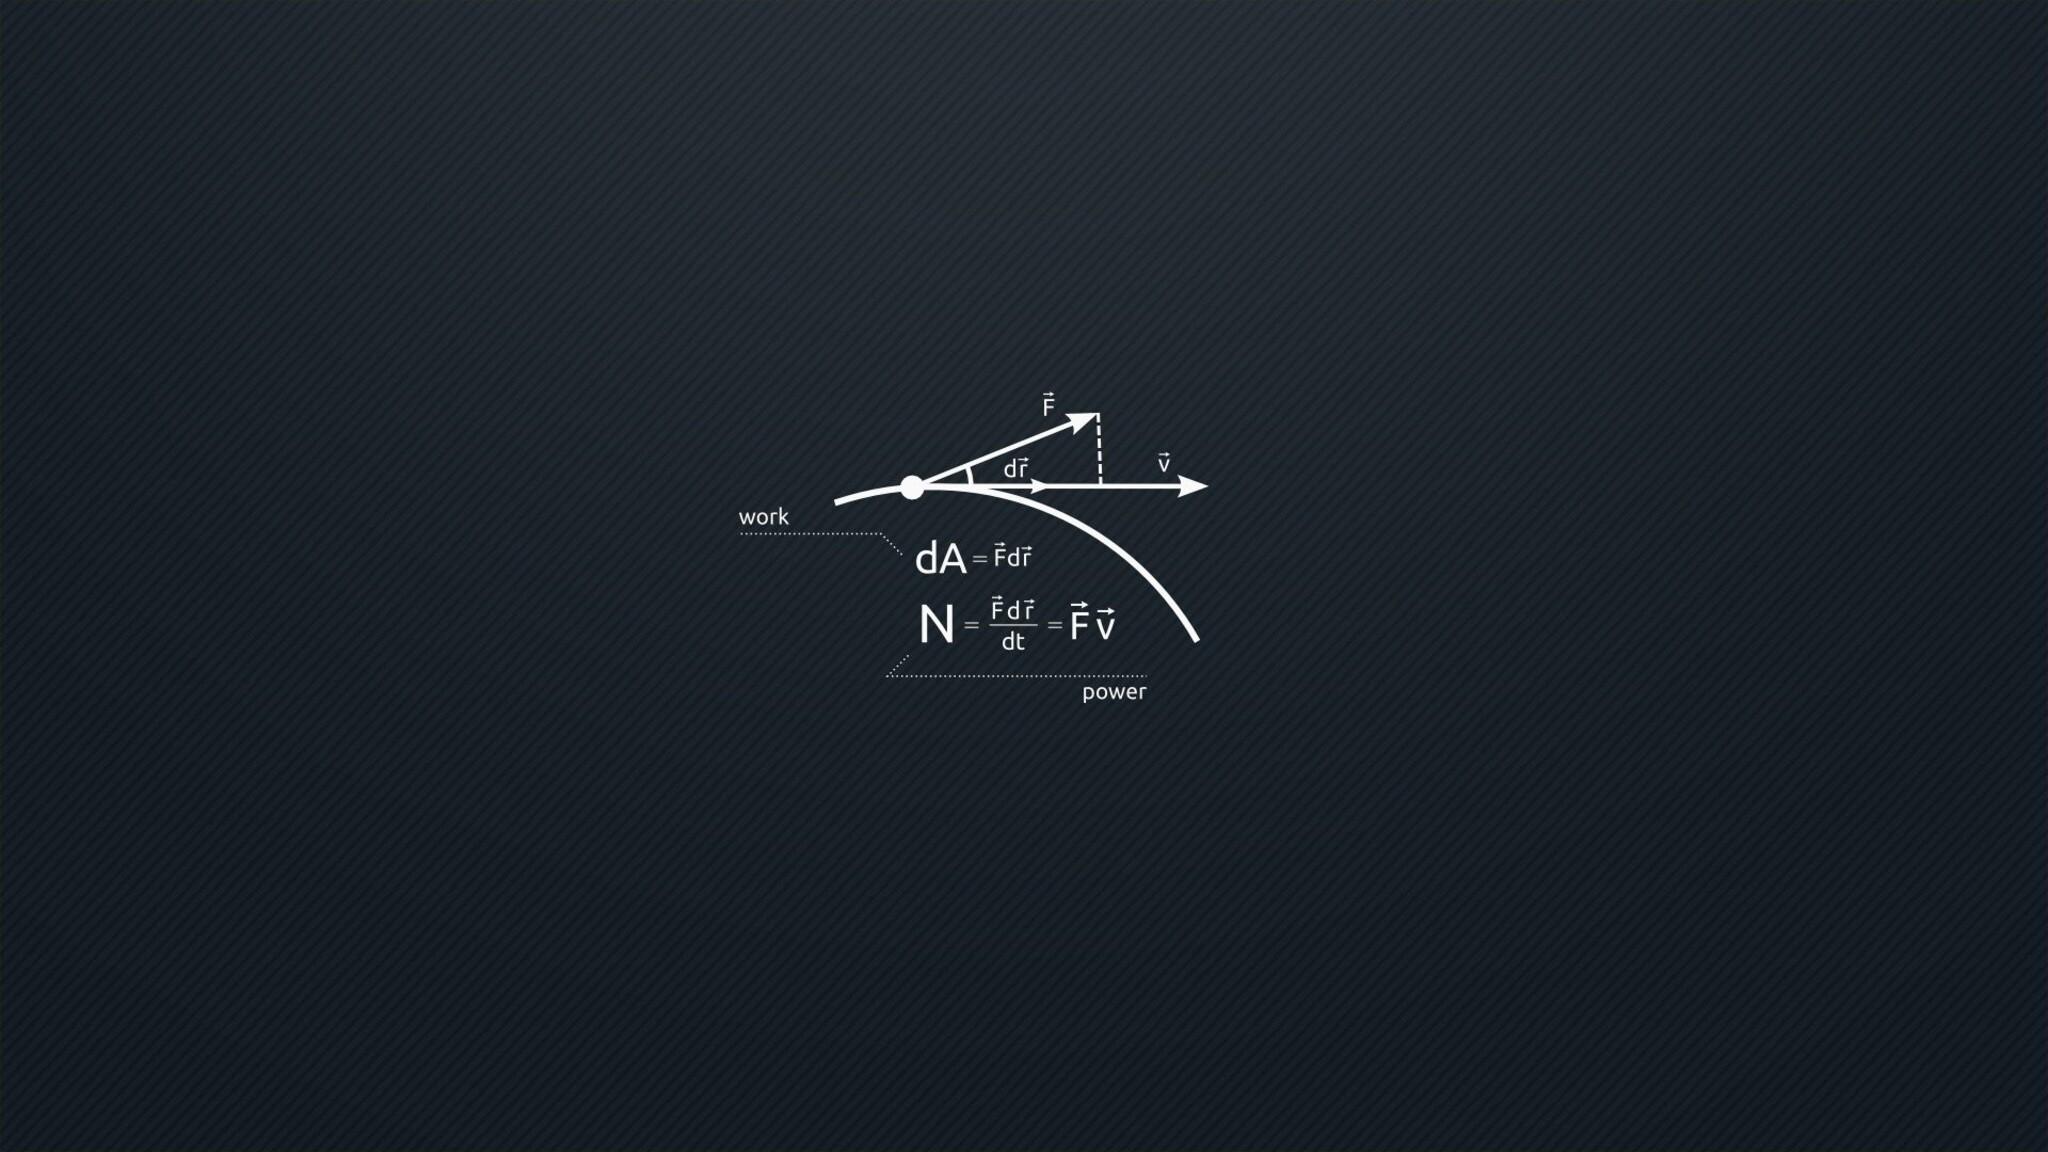 2048x1152 Dynamic Science Physics 2048x1152 Resolution Hd 4k